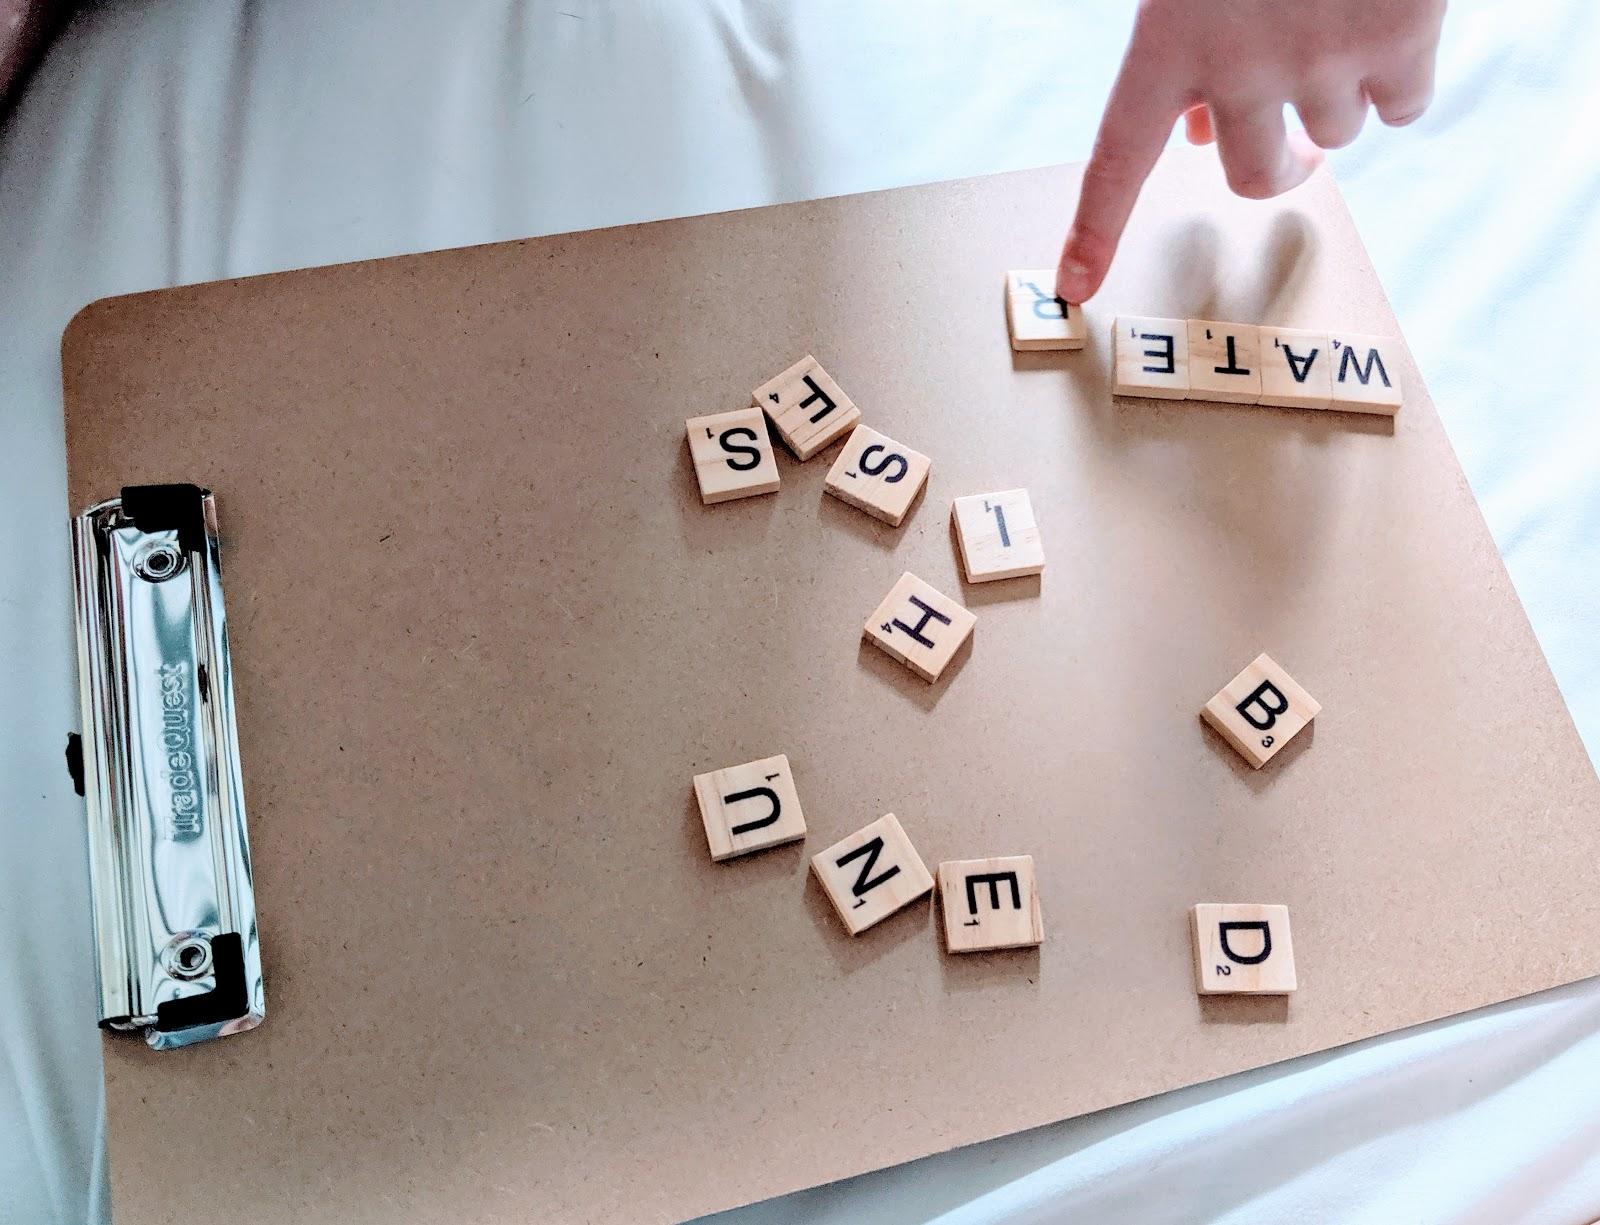 Scrabble tiles for spelling practice